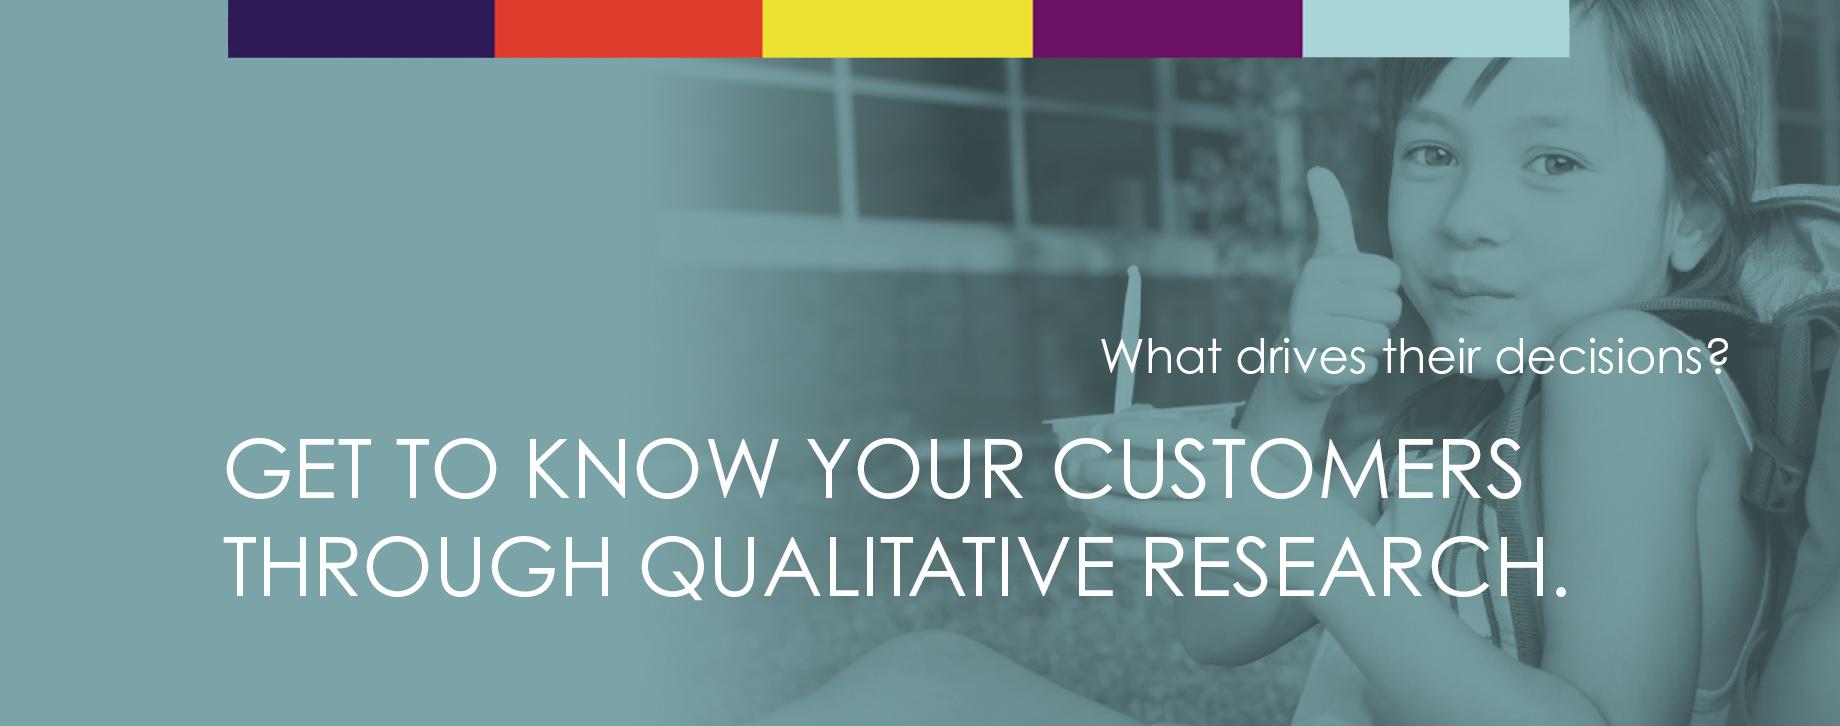 Clift Focus Group Moderator - Qualitative Research 05.jpg